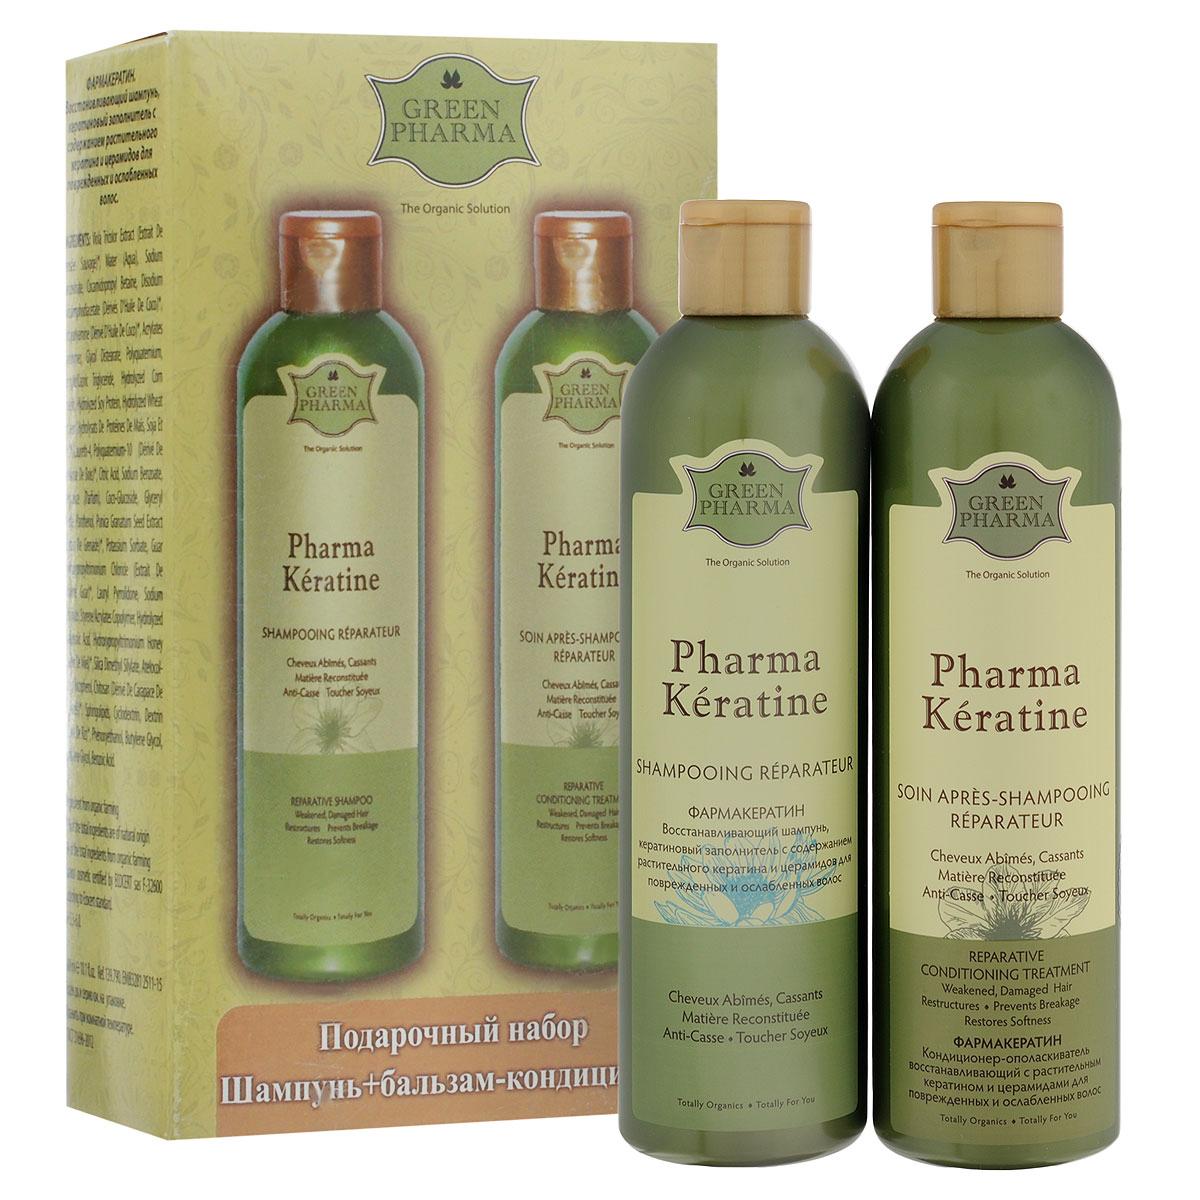 Greenpharma Подарочный набор №1: шампунь Pharma Keratine, кондиционер-ополаскиватель Pharma Keratine, 2х300 мл восстанавливающий уход без смывания absolue keratine 100 мл